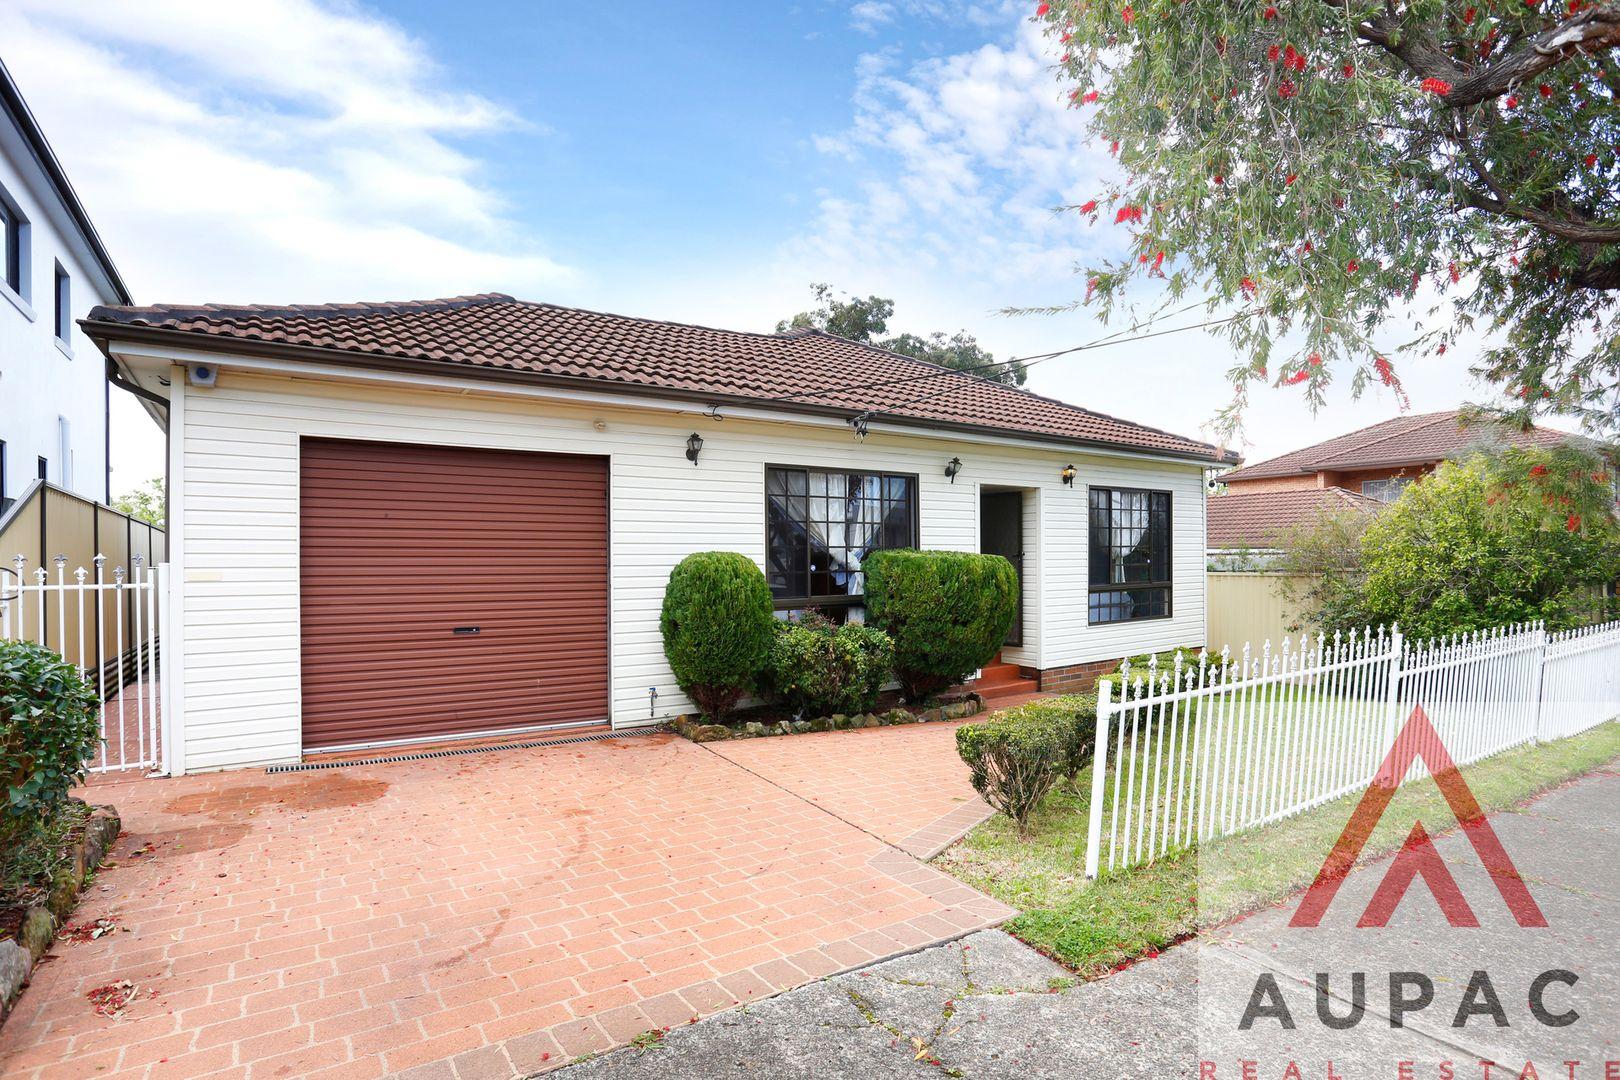 15 Mount Auburn Road, Berala NSW 2141, Image 0